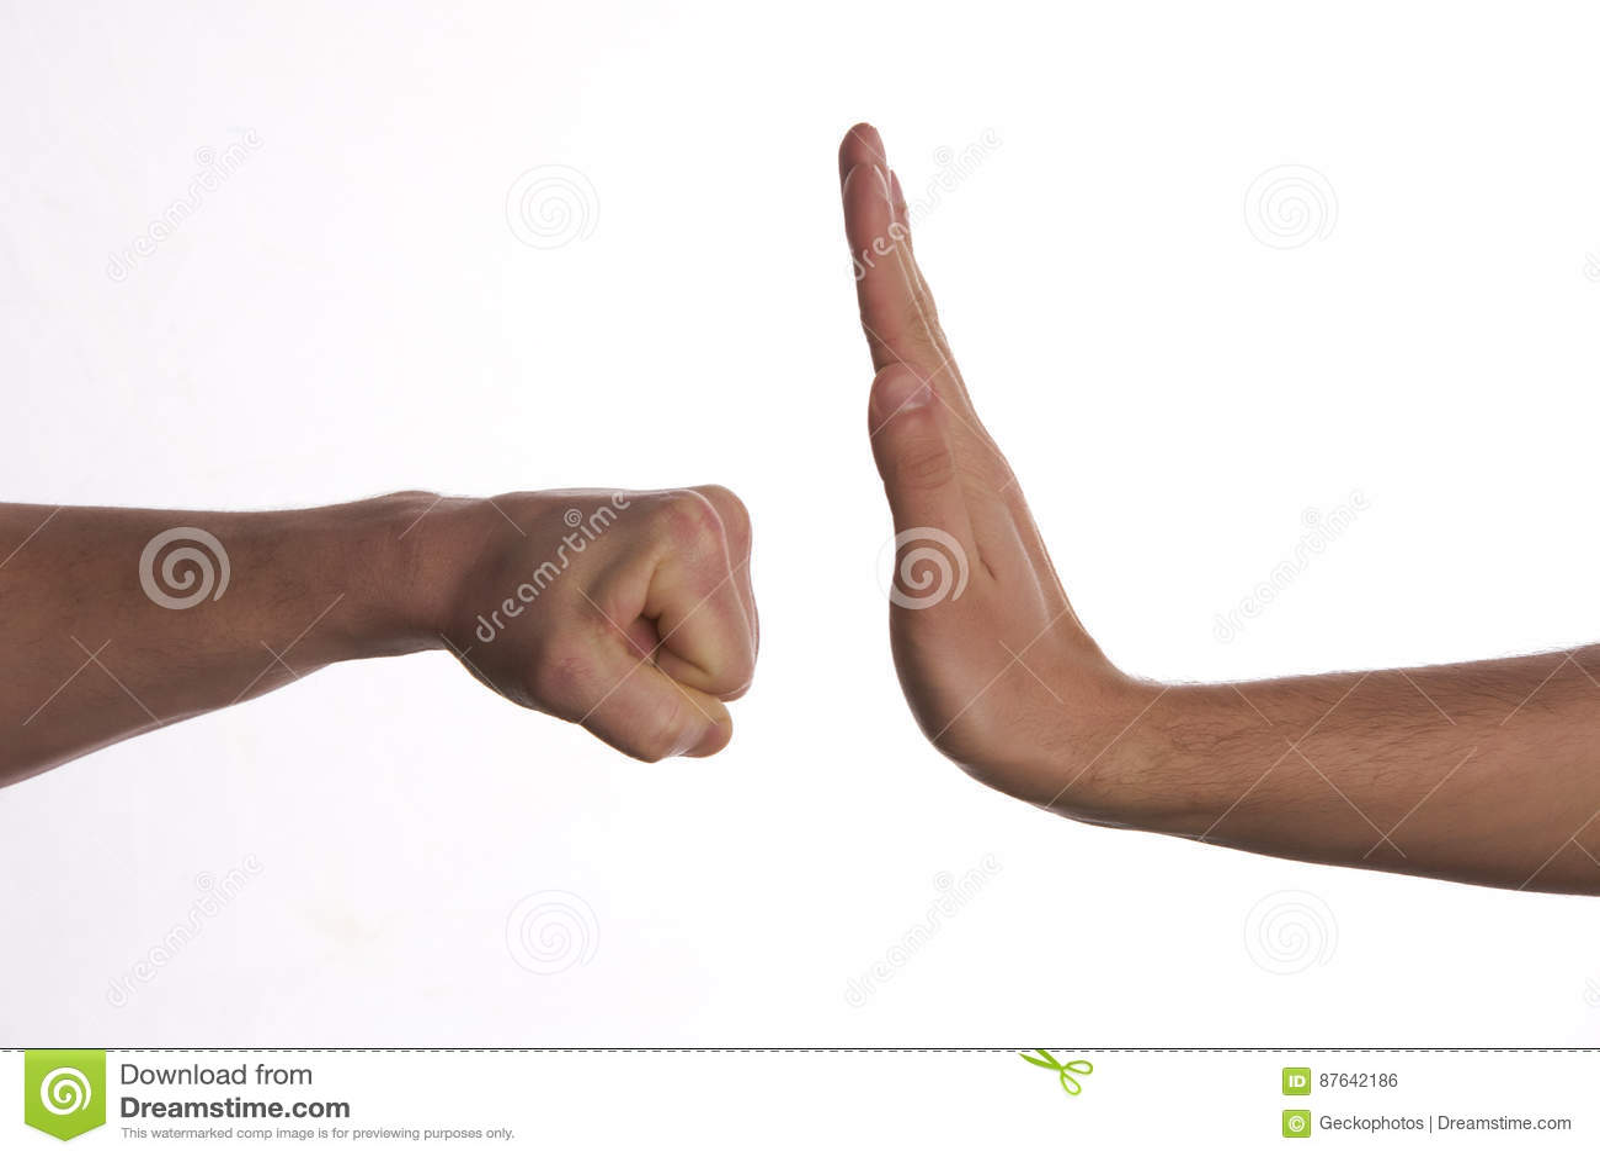 Jeden ręka zapobiega poncza ataka inna ręka